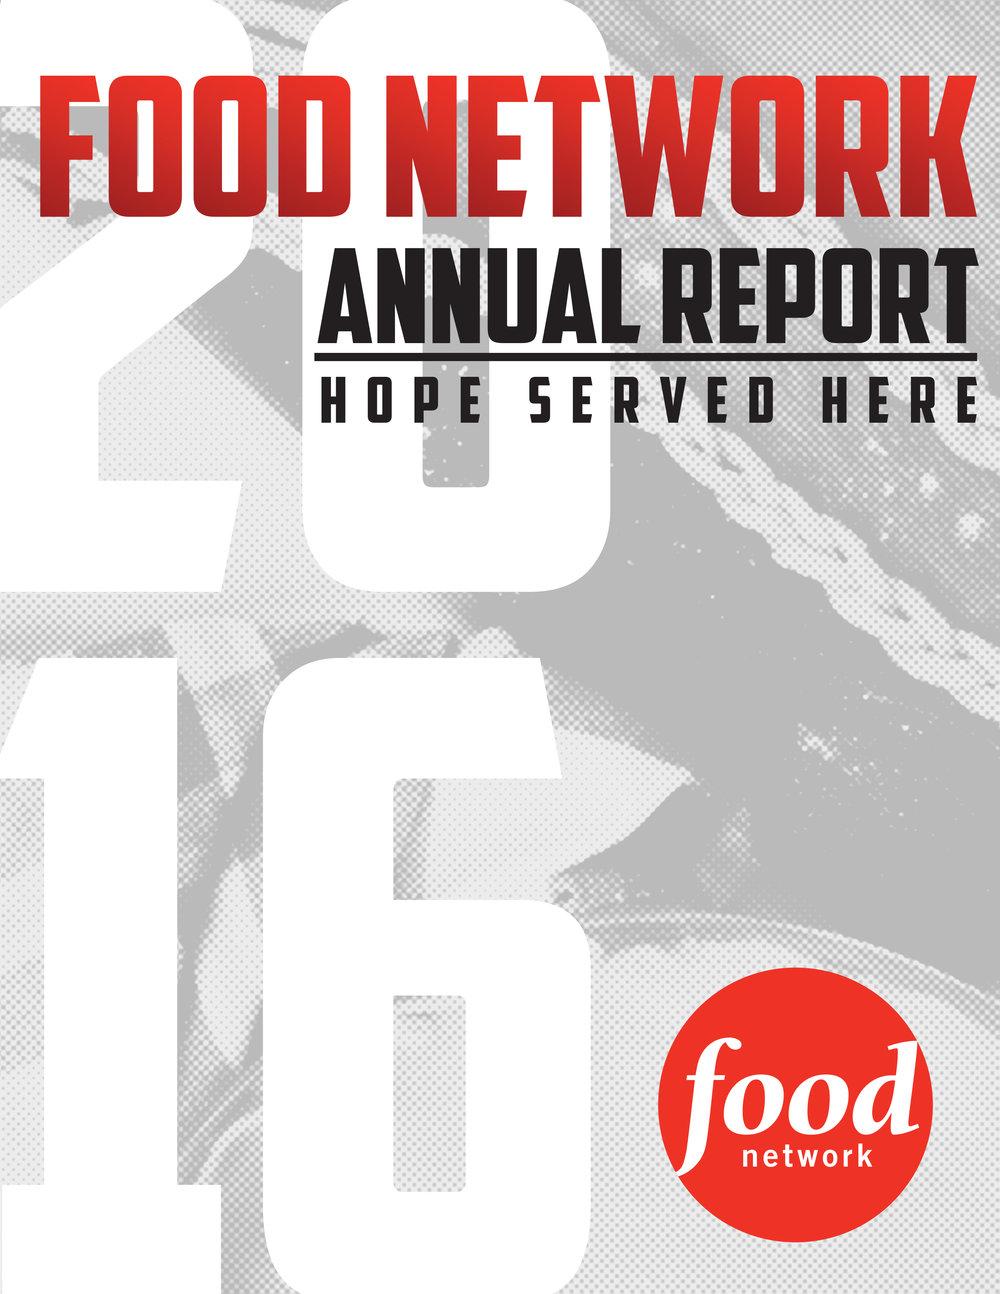 Annual report-1.jpg